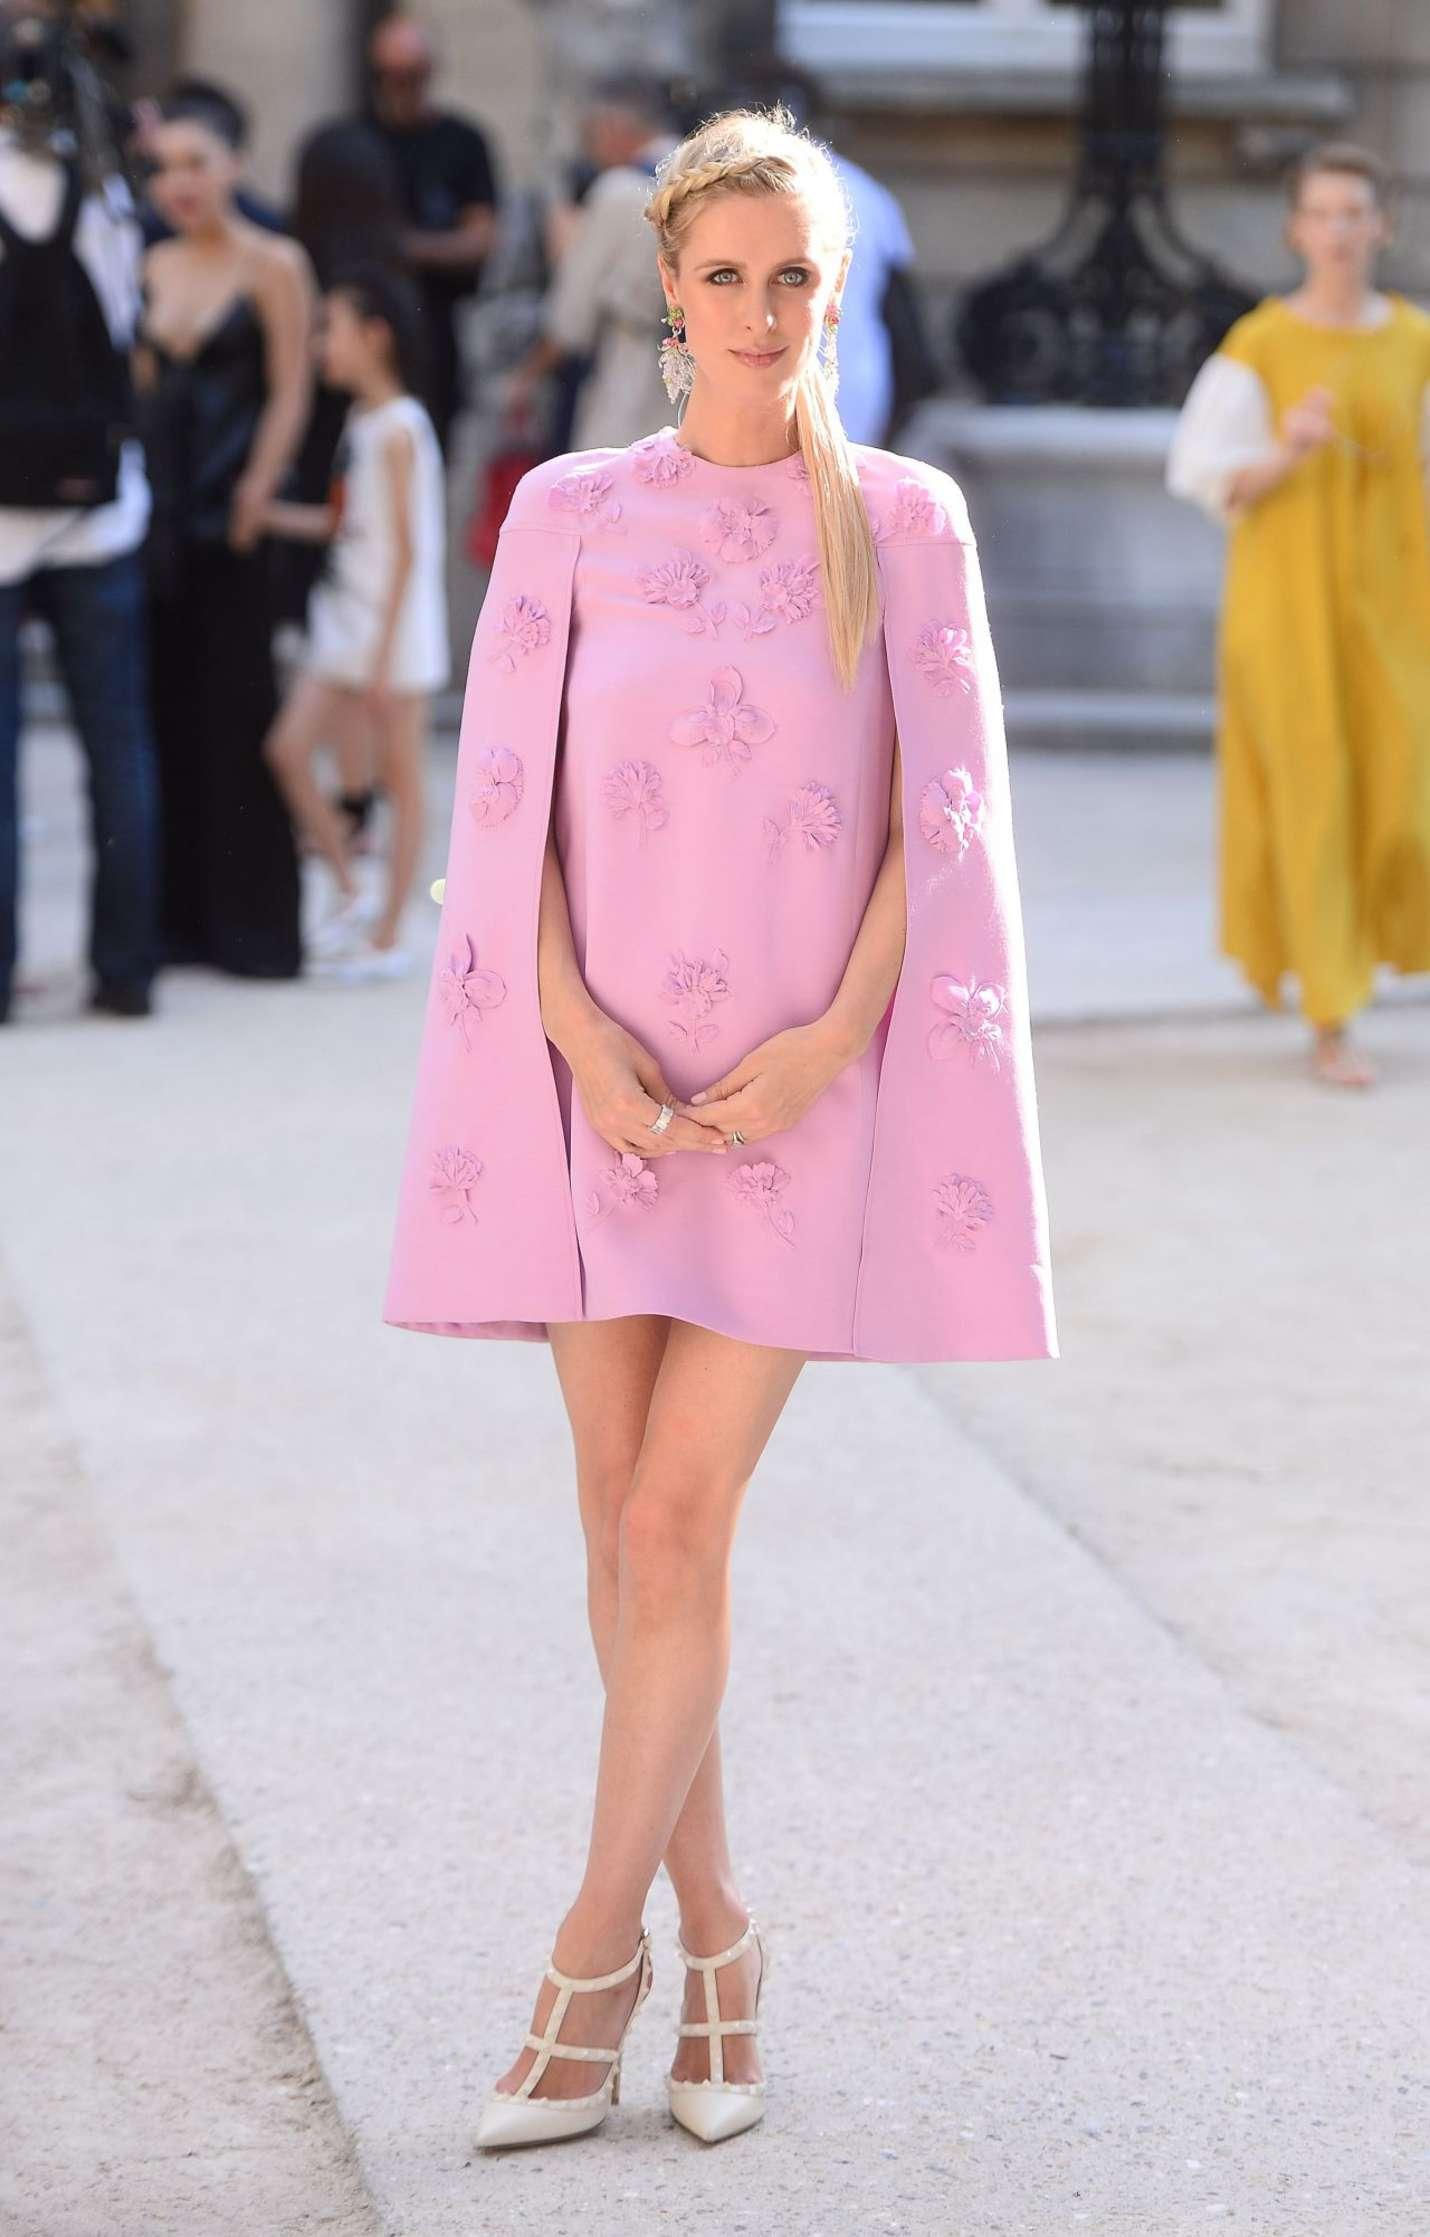 Nicky Hilton 2017 : Nicky Hilton: Leaves the Valentino Fashion Show 2017 -07